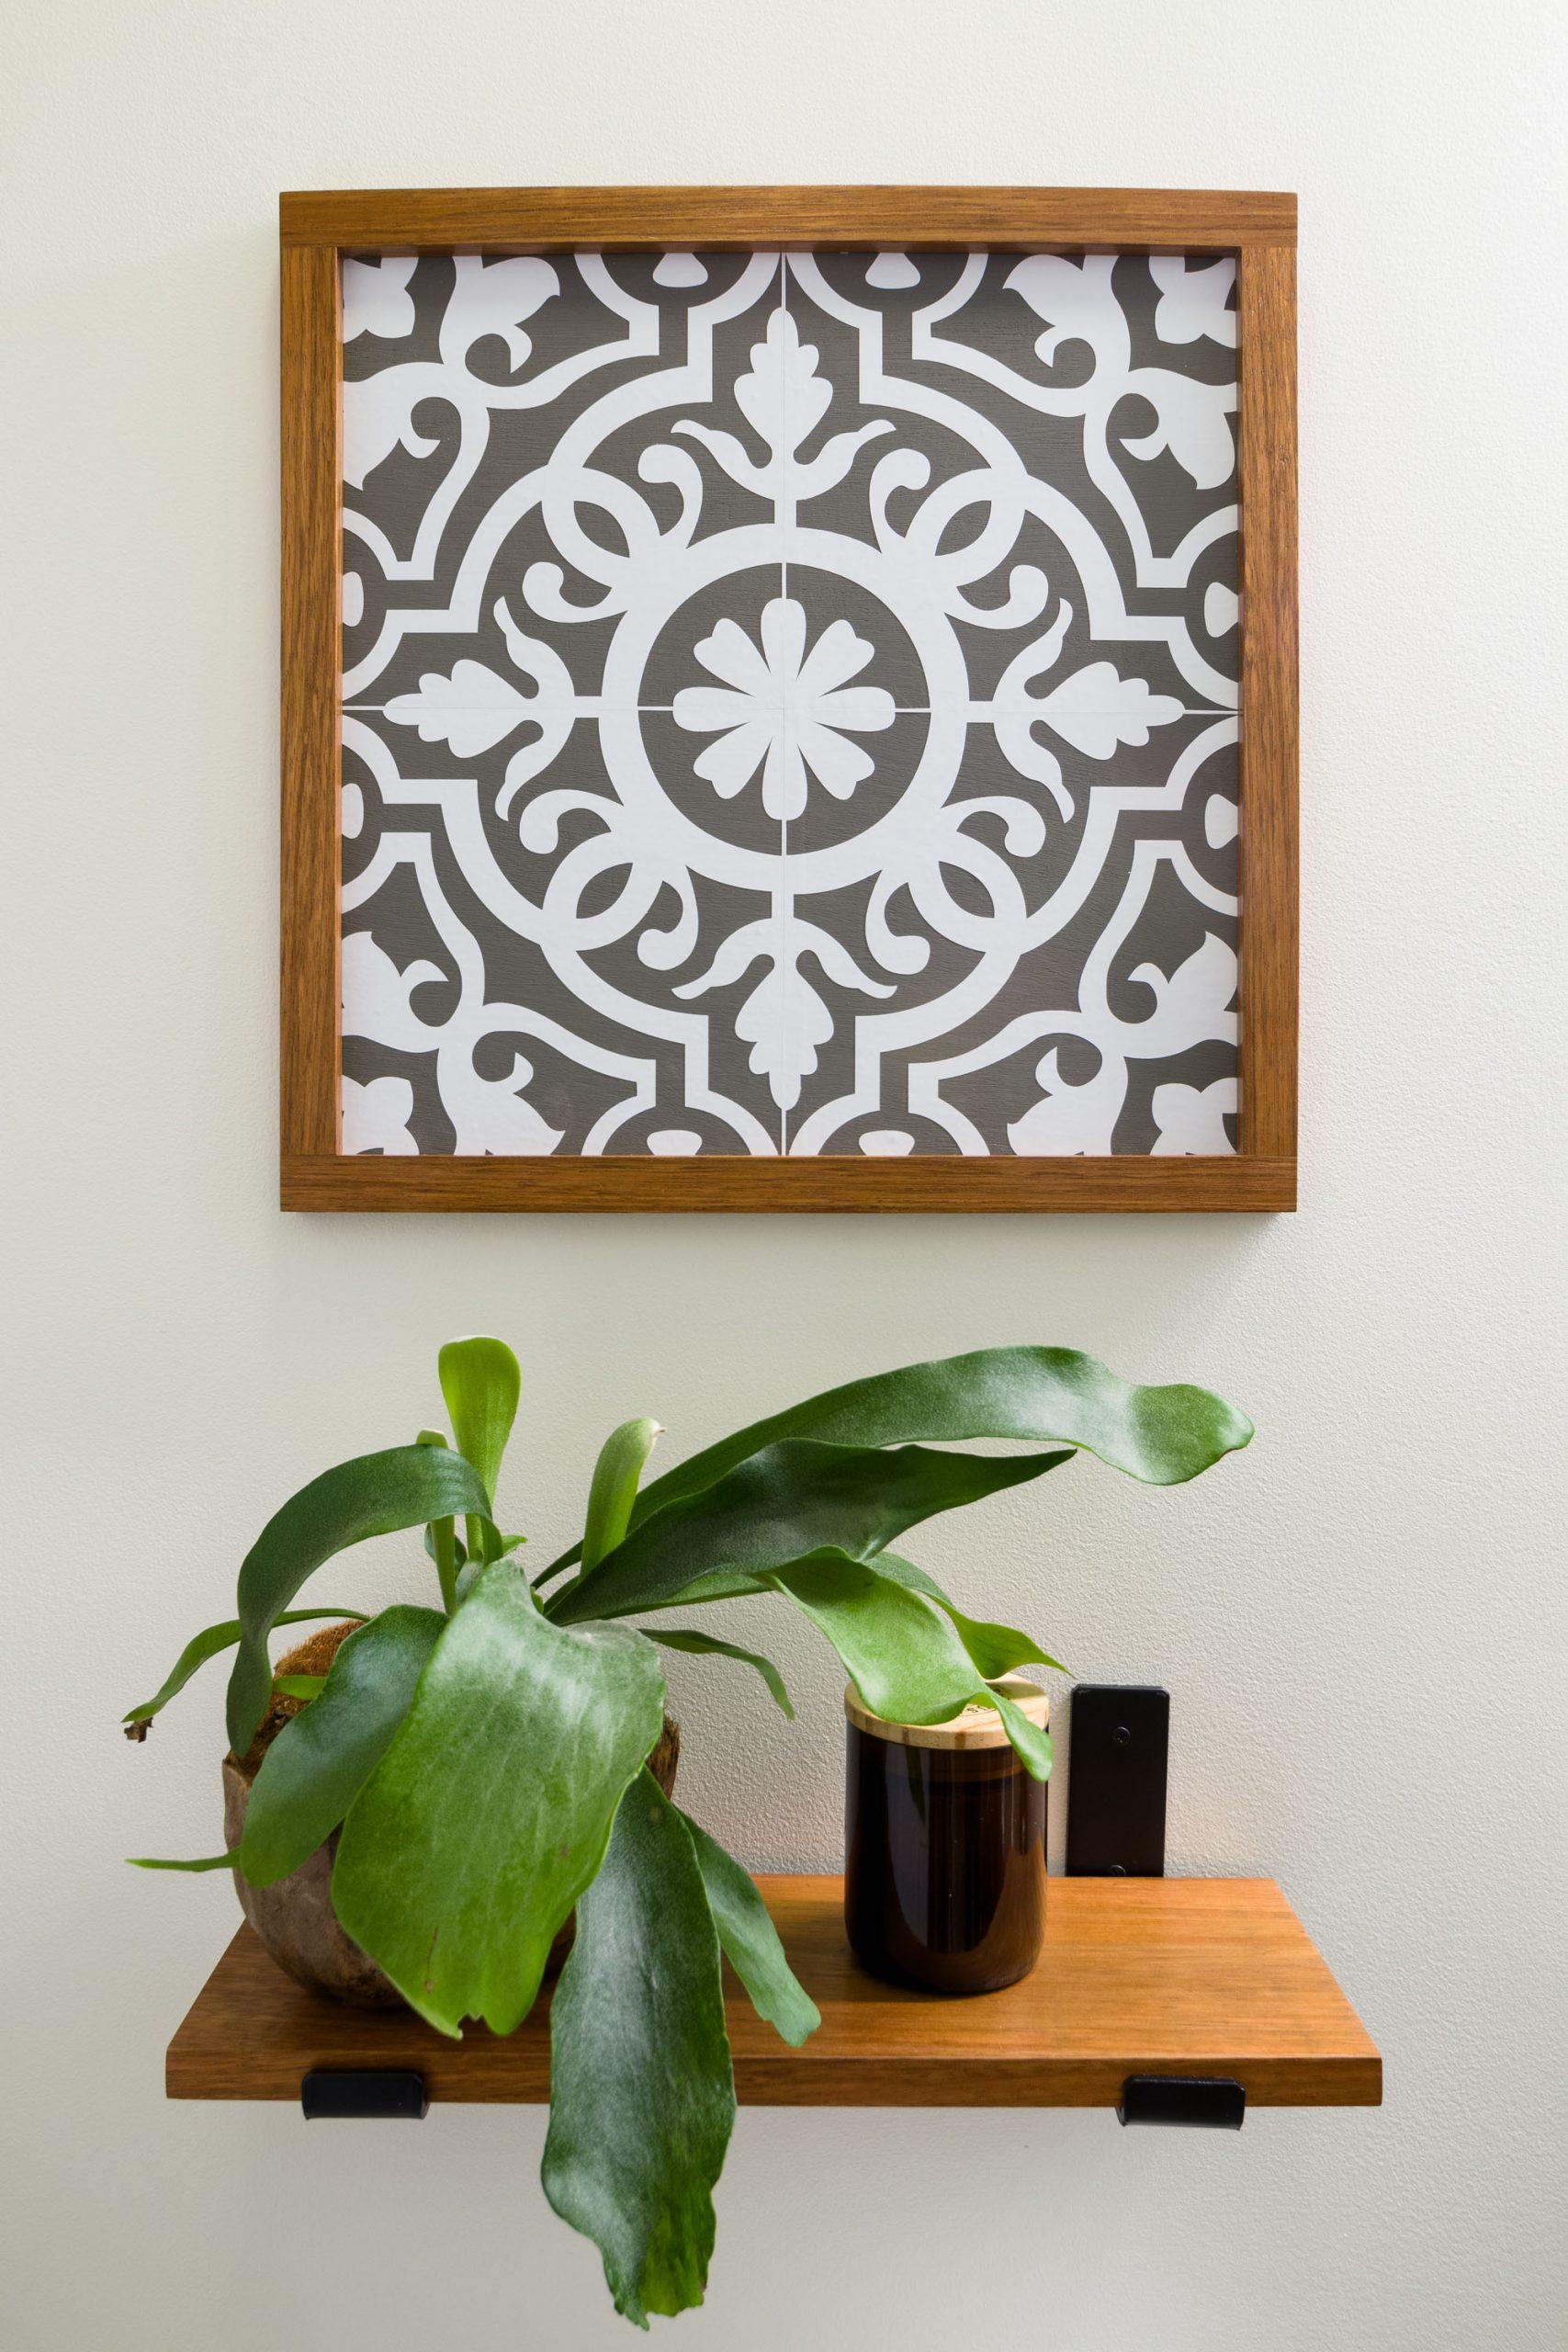 Faux Tile Stencil Art, Accessories, SVG Files, Easy DIY